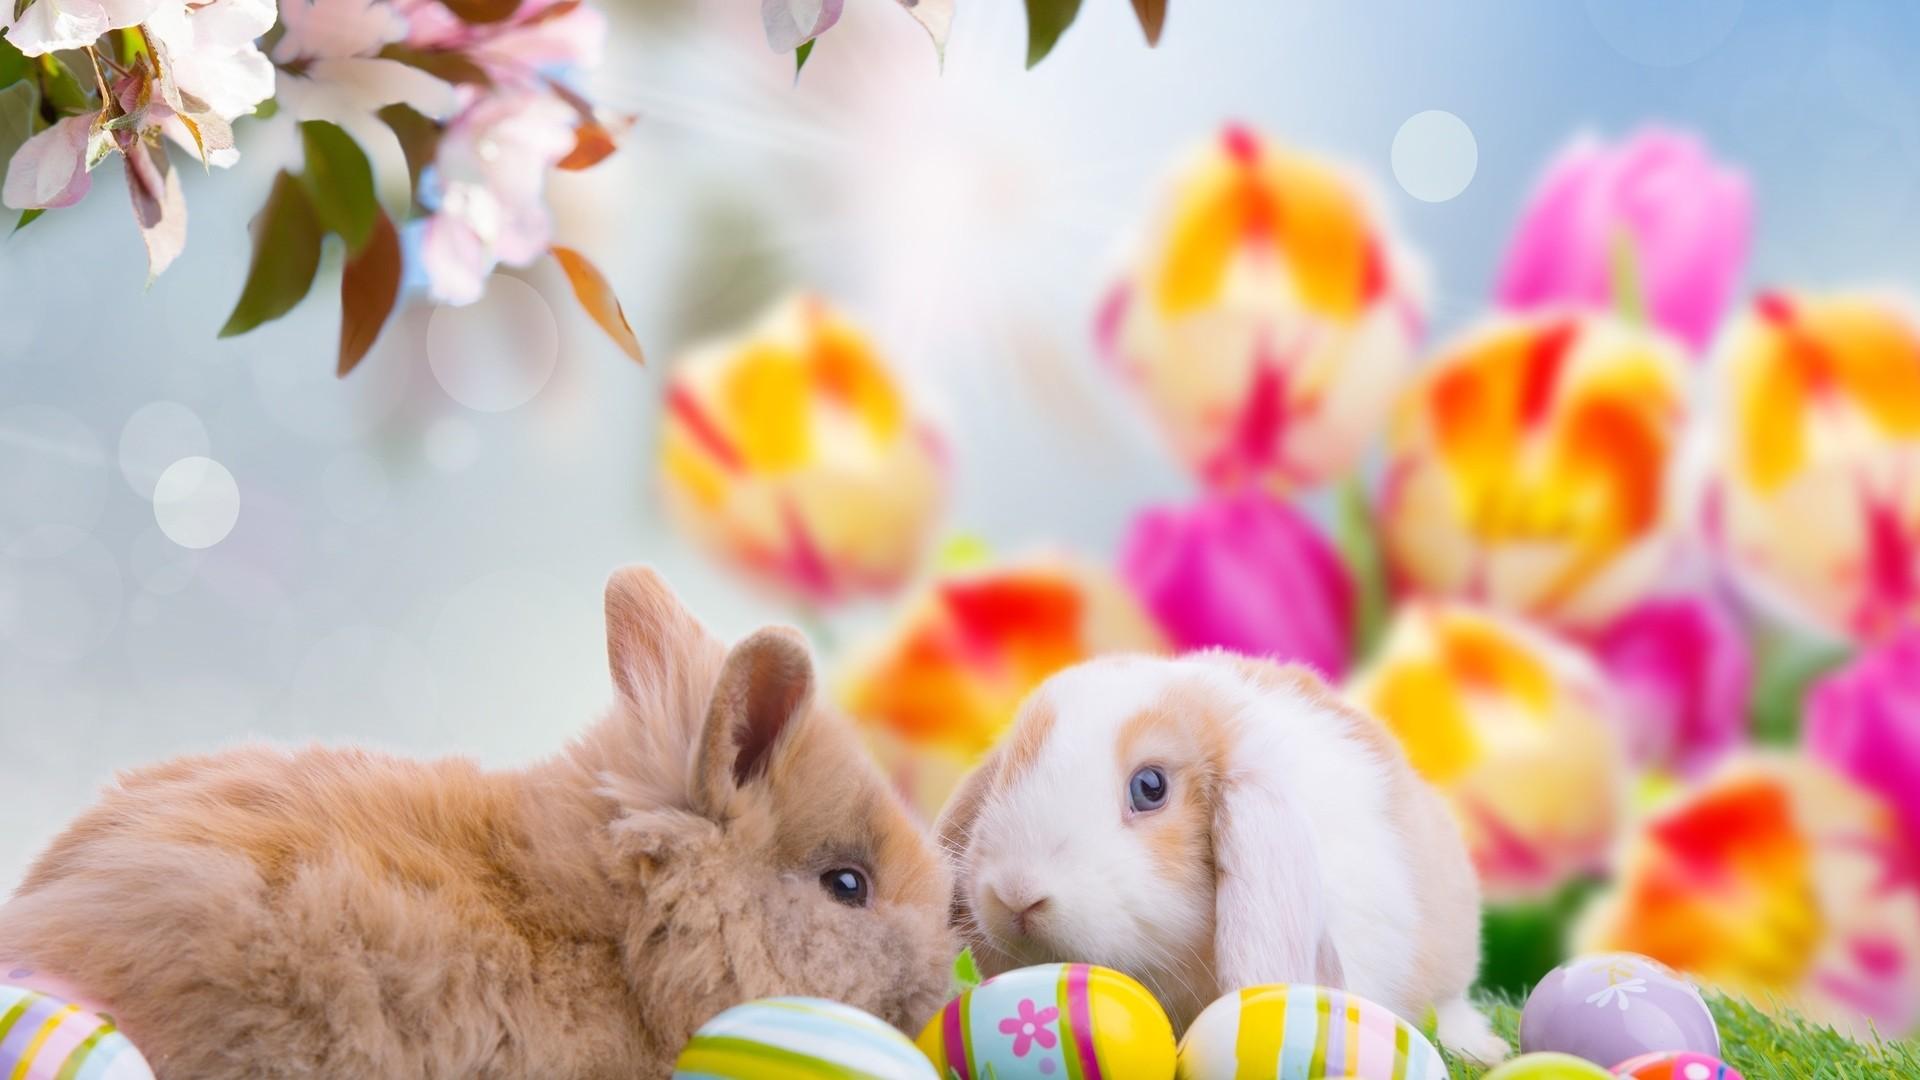 Cute Easter Wallpaper 1920x1080